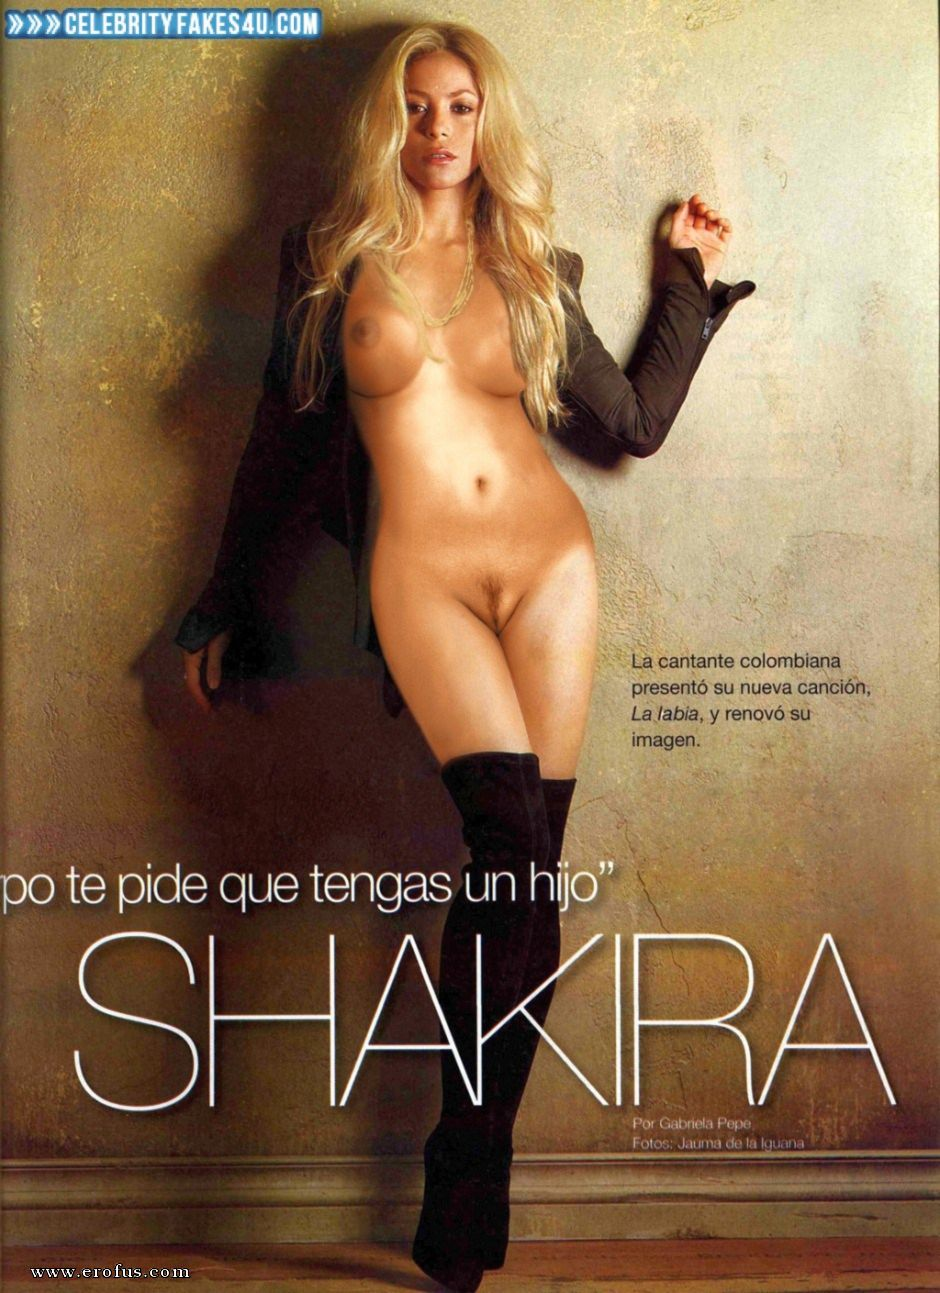 Shakira fappening